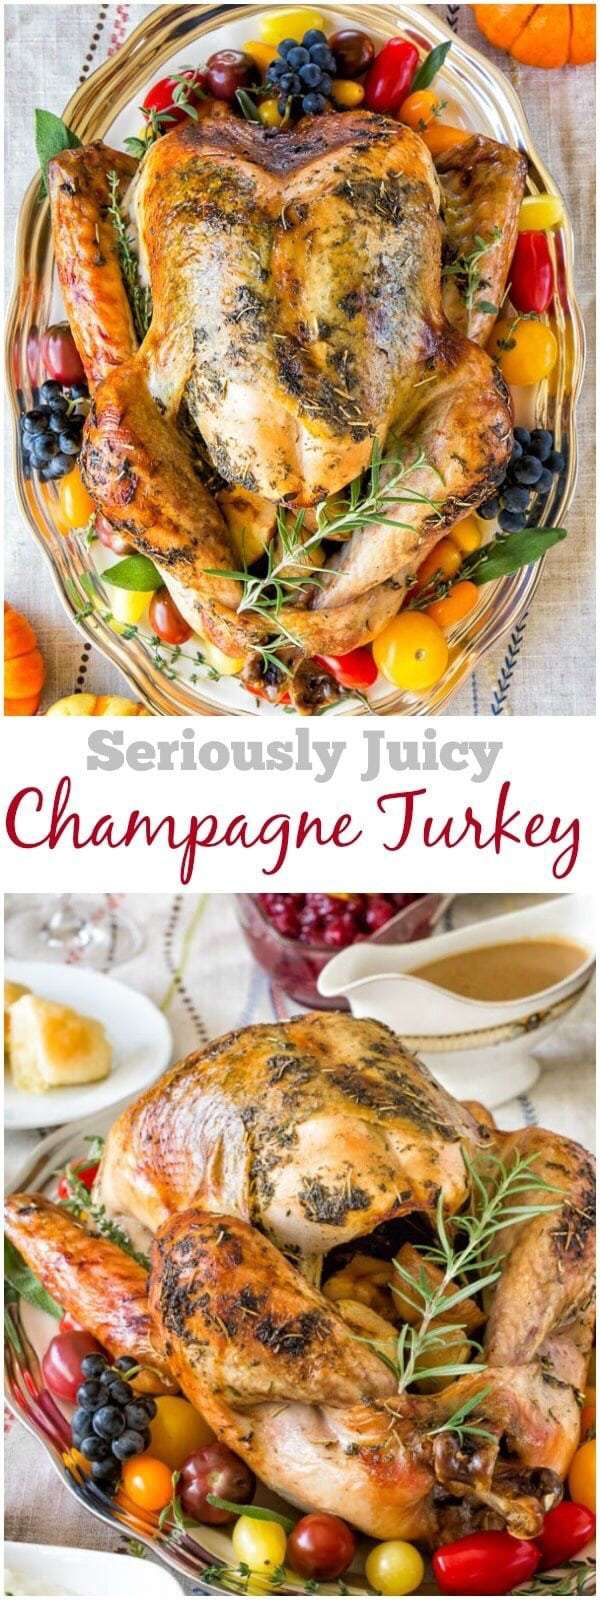 Thanksgiving turkey recipes: Super Juicy No Brine Roast Turkey